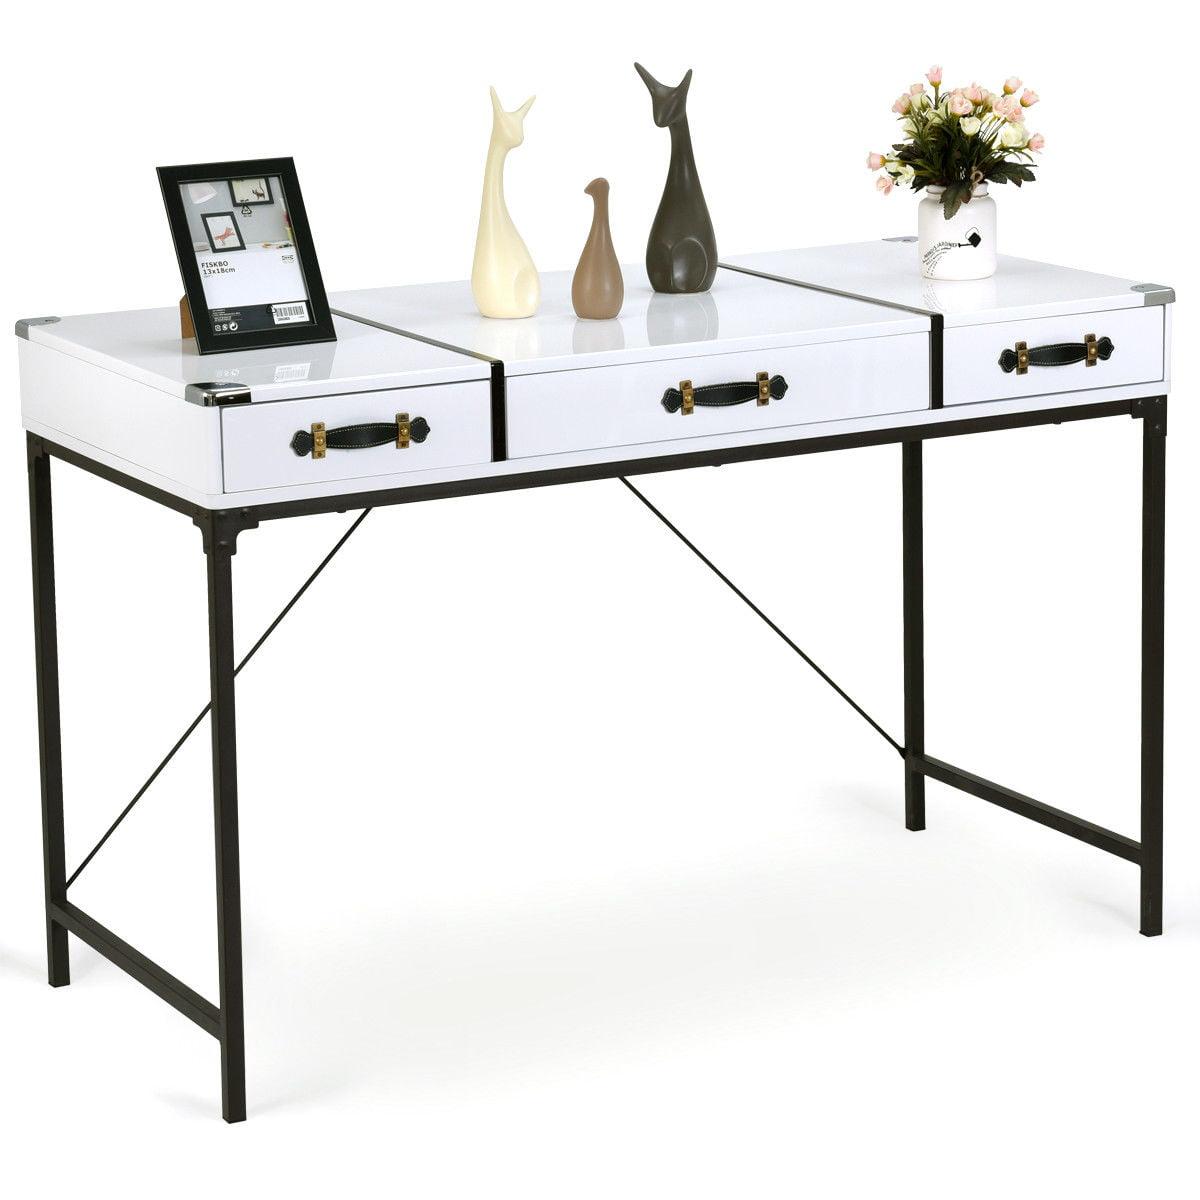 Gymax Modern 3 Drawer Console Table Desk Organizer Hallway Living